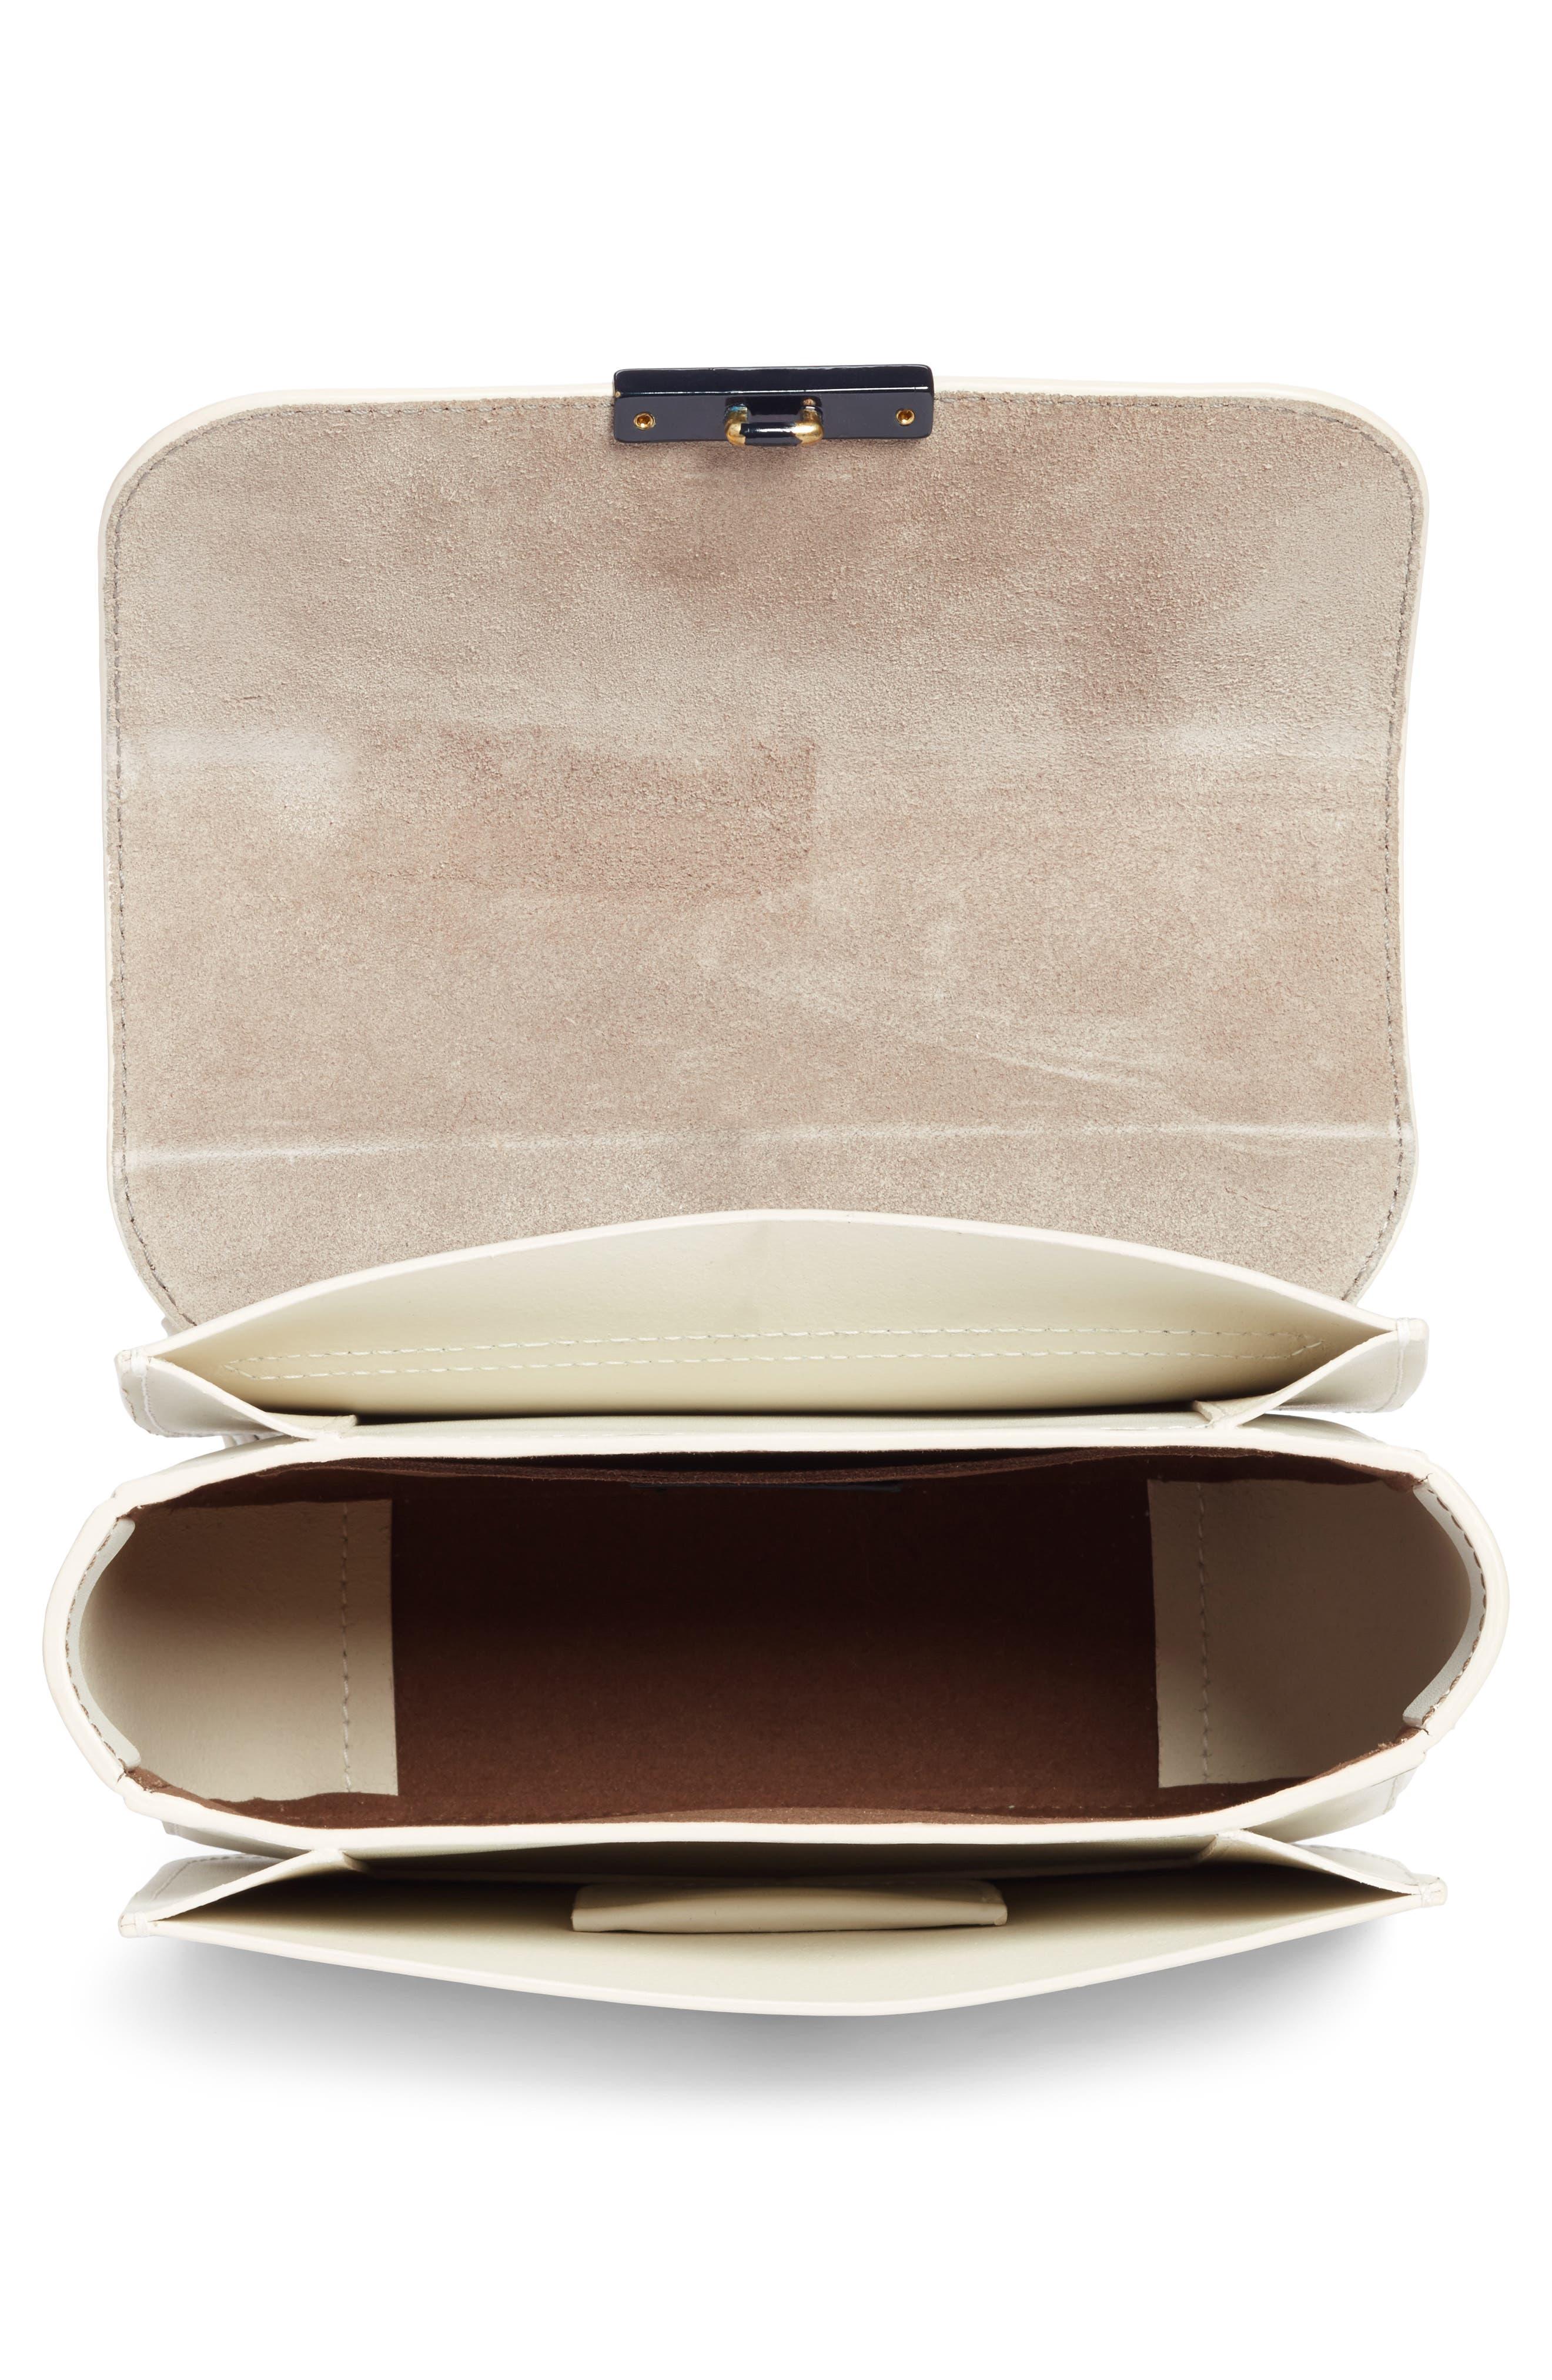 Elisir Mini Crossbody Bag,                             Alternate thumbnail 4, color,                             Petalo